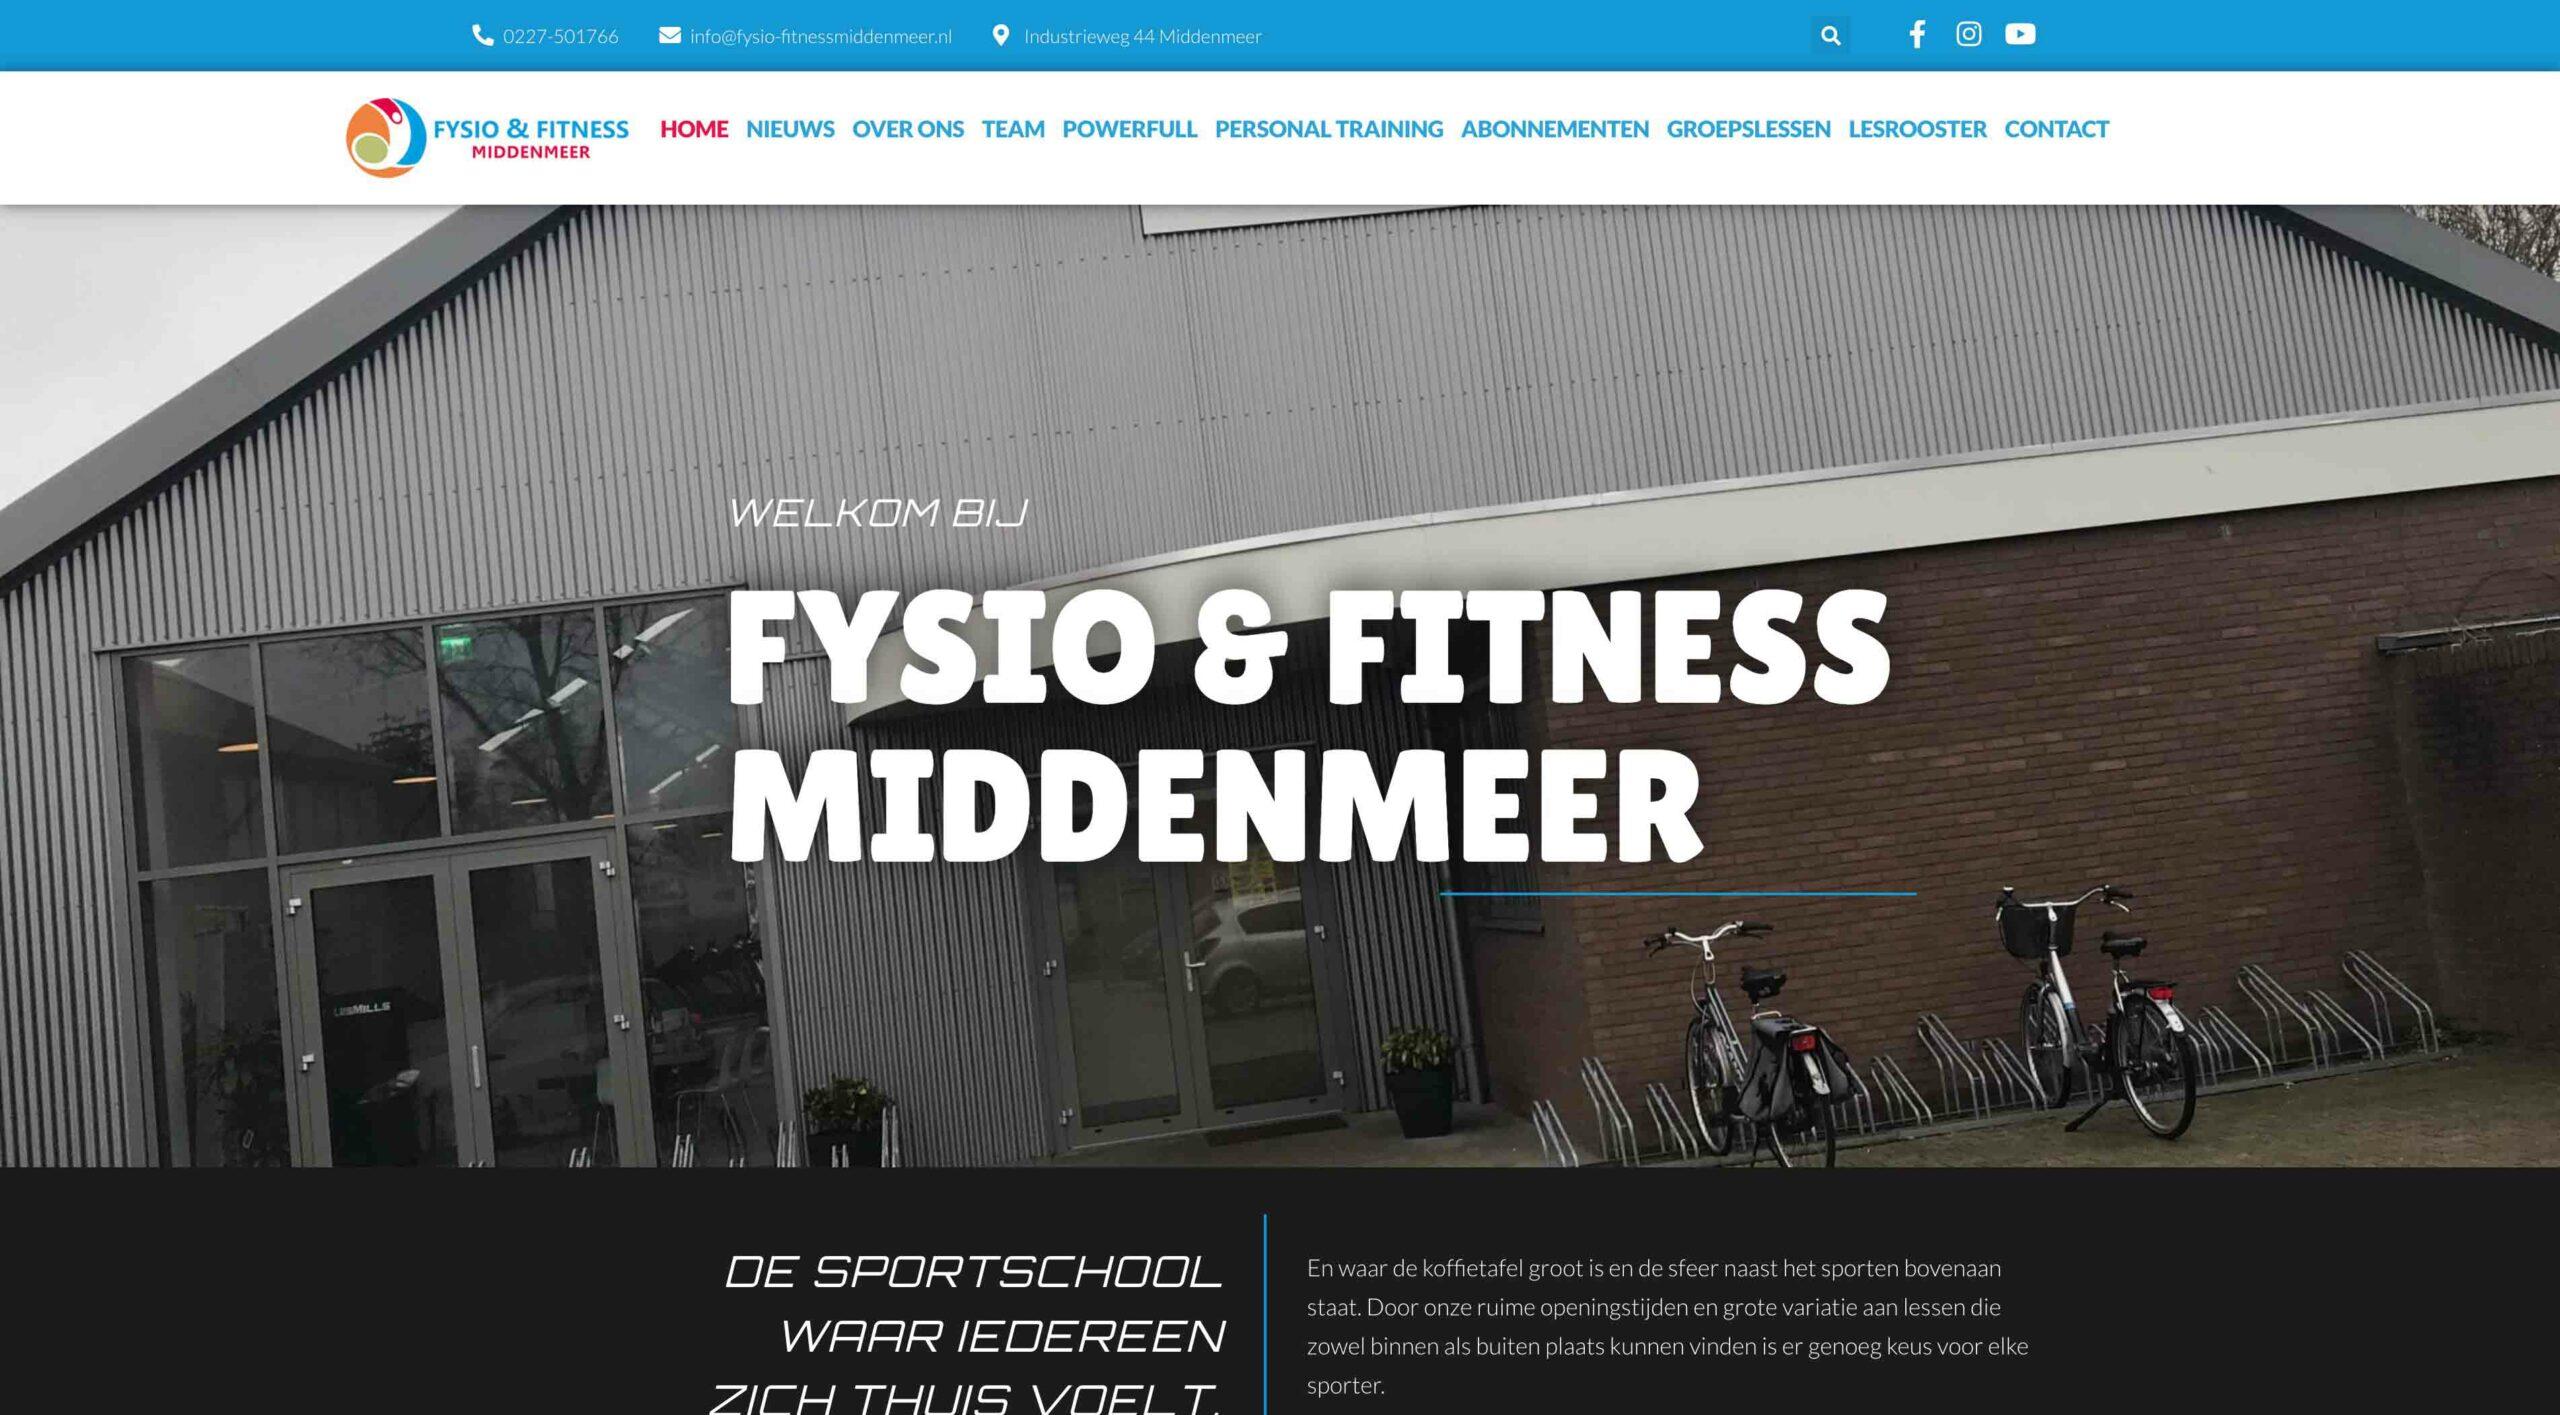 313 - Fysio & Fitness Middenmeer